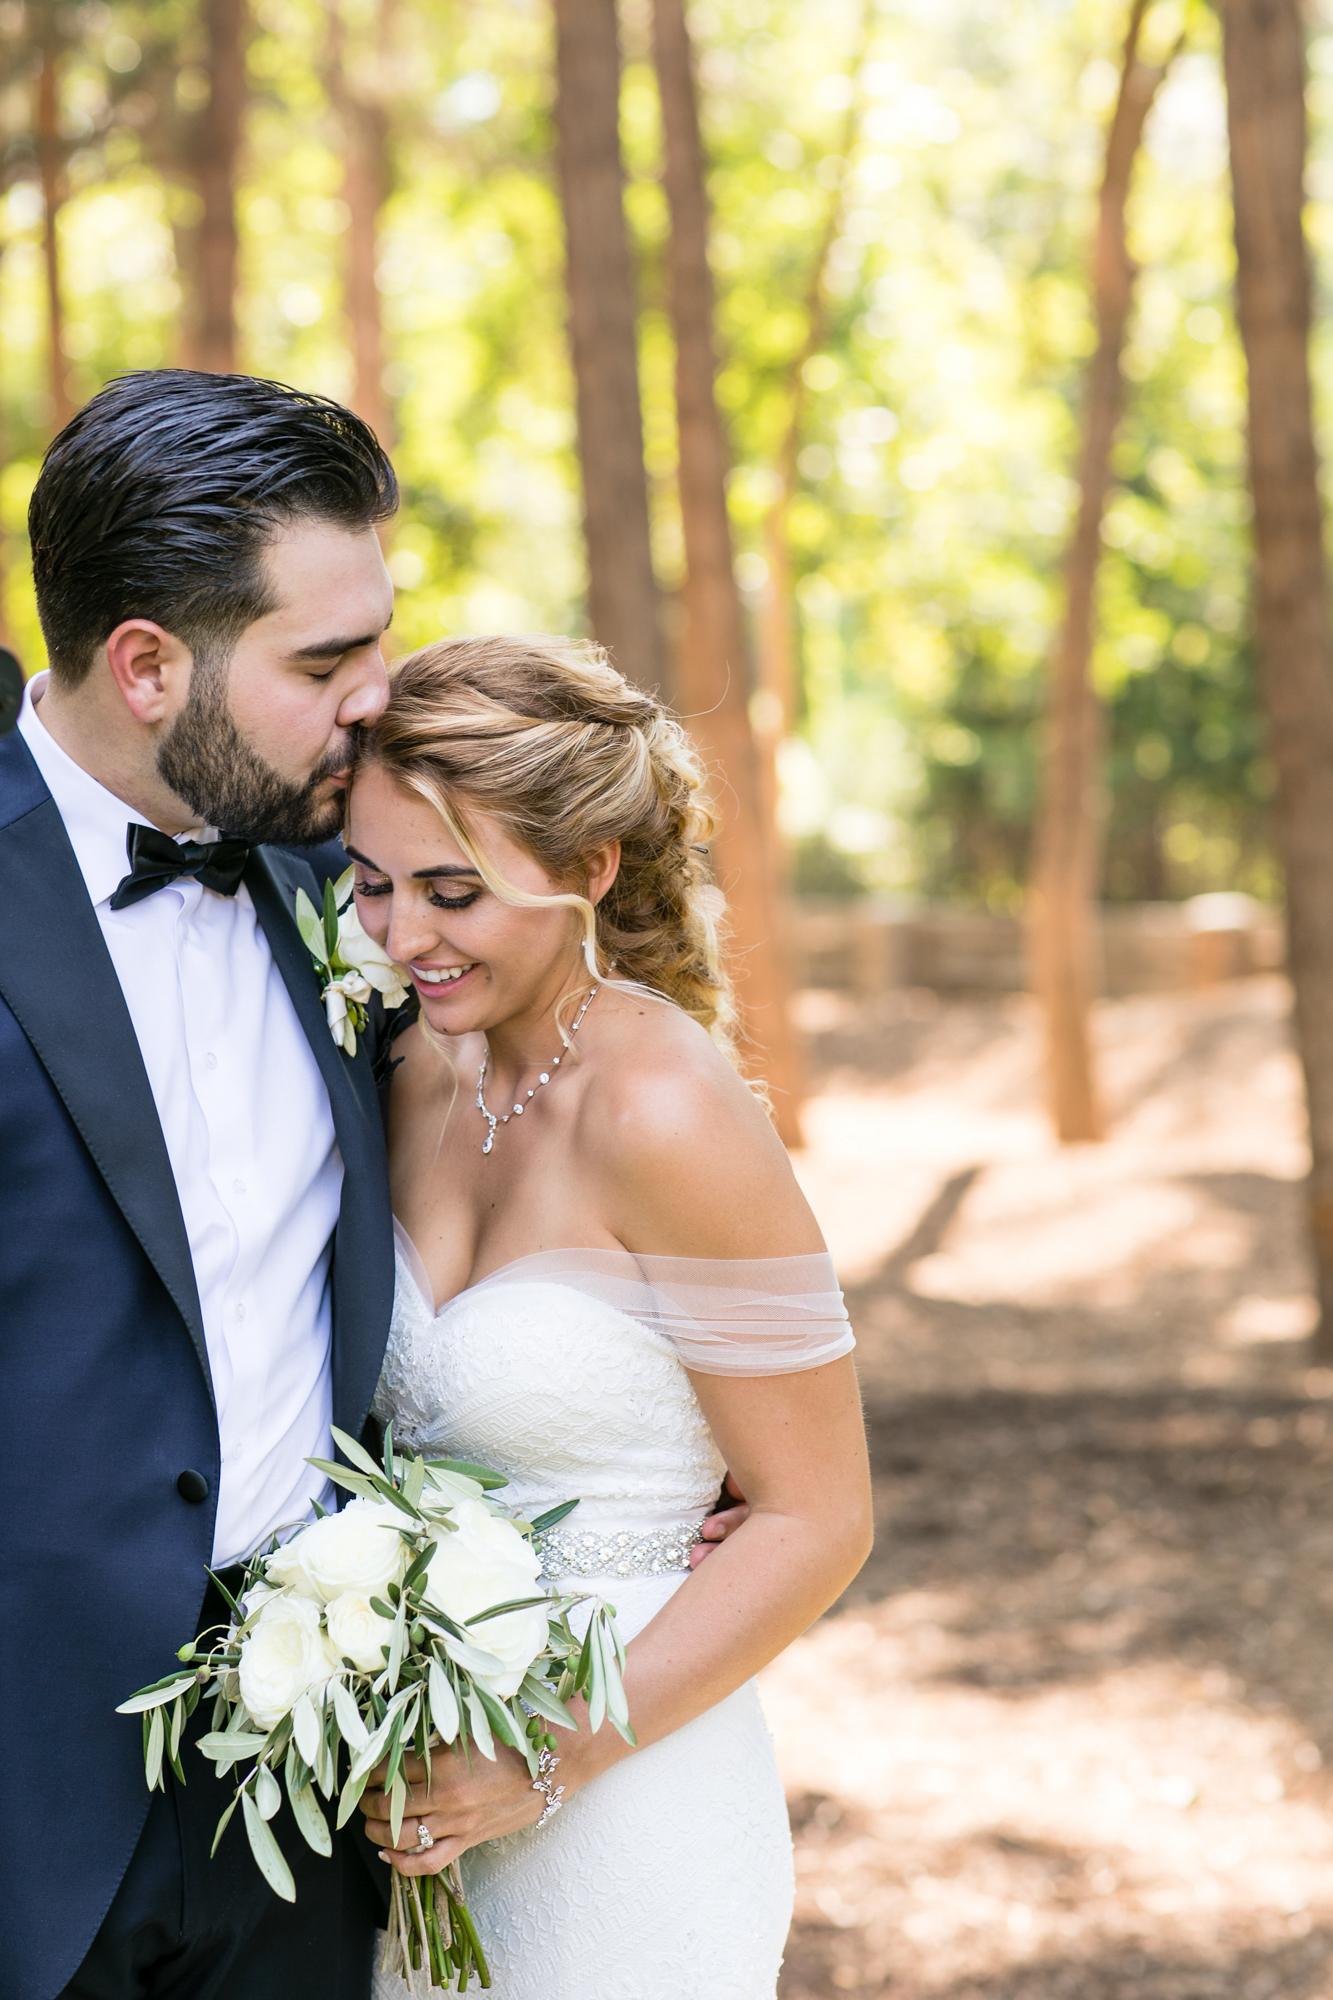 greek-wedding-salt-lake-city-utah-33.jpg